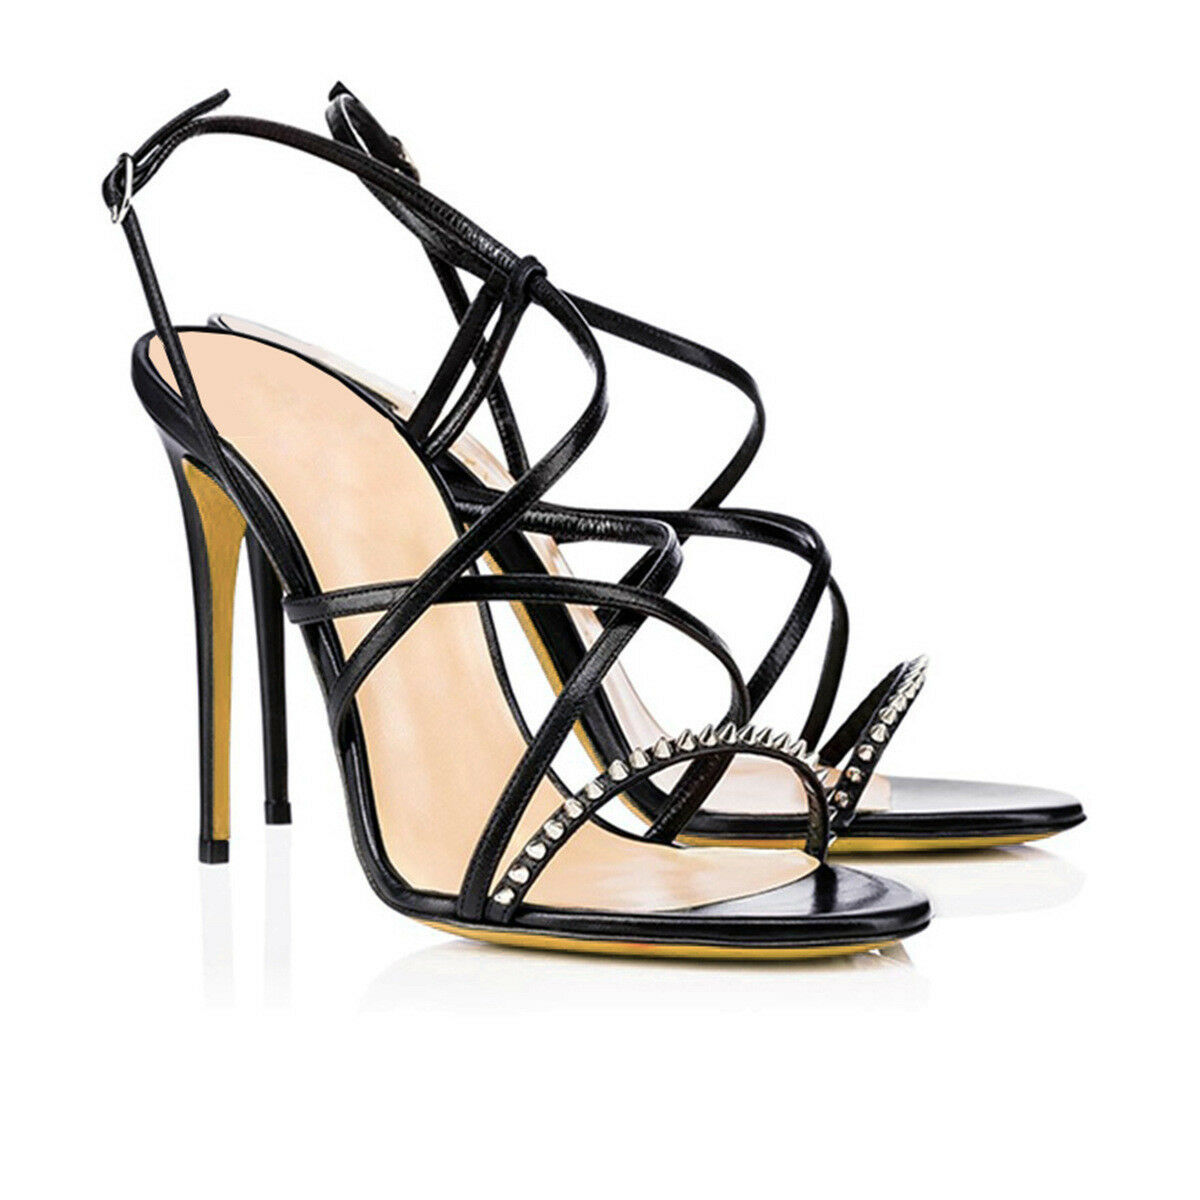 alla moda donna Sexy Peep Peep Peep Toe Ankle Strap High Heel Party Sandals Rivets Stiletto Heels  marche online vendita a basso costo